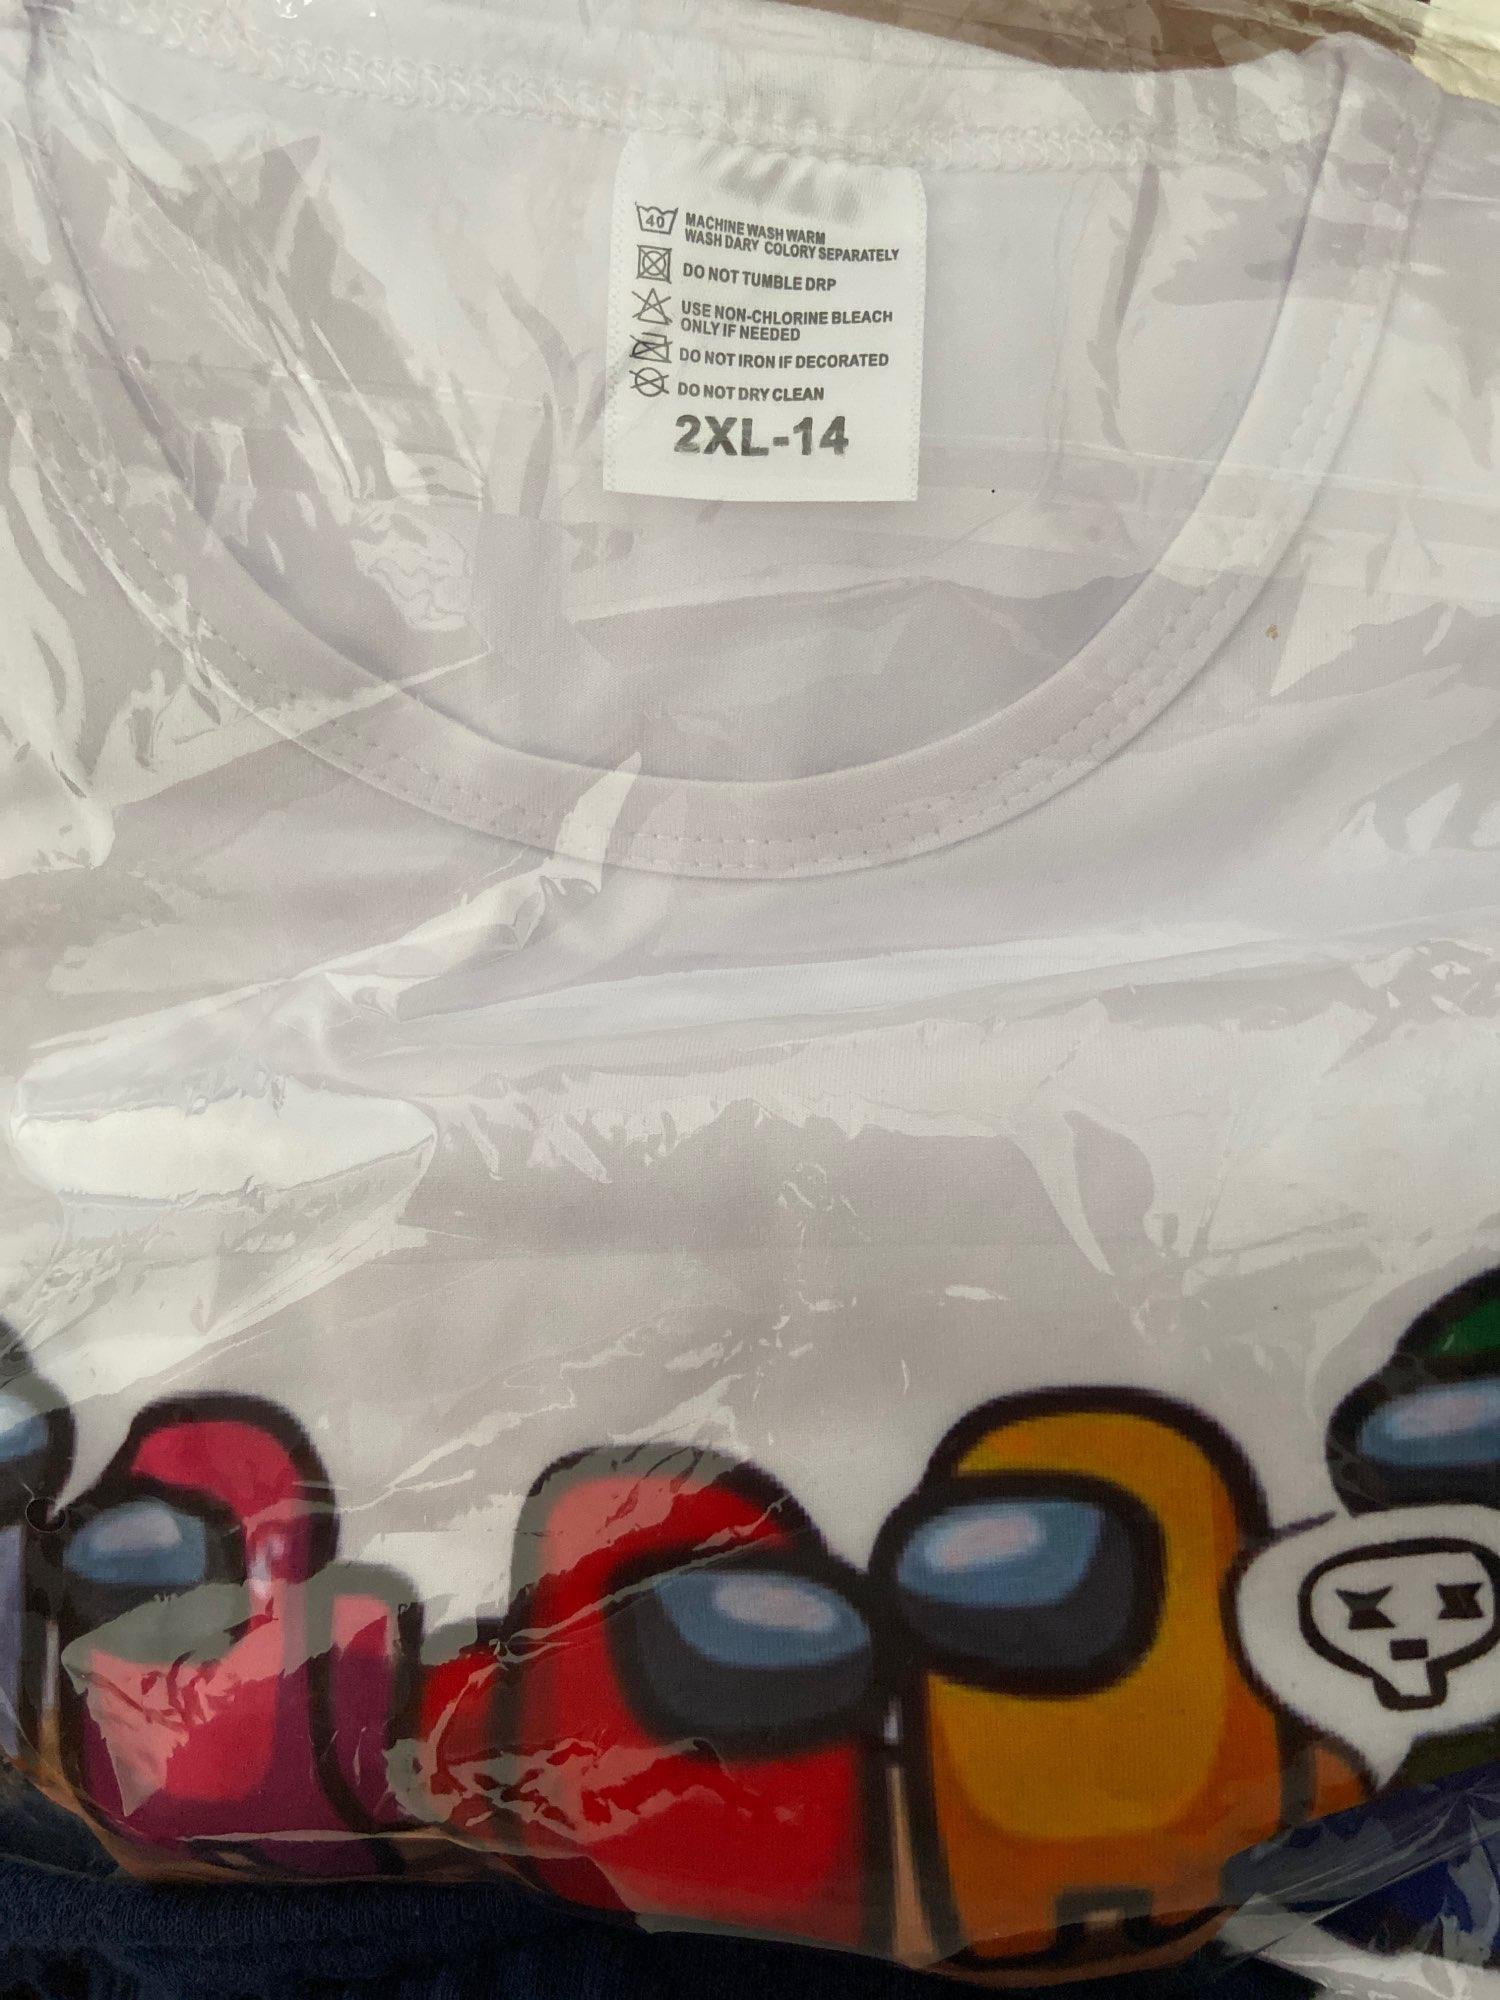 T Shirt Kids Clothes For Girls Boys Camisetas Poleras Tee Enfant Stranger Things Ni?as Ropa De Moda One Piece photo review